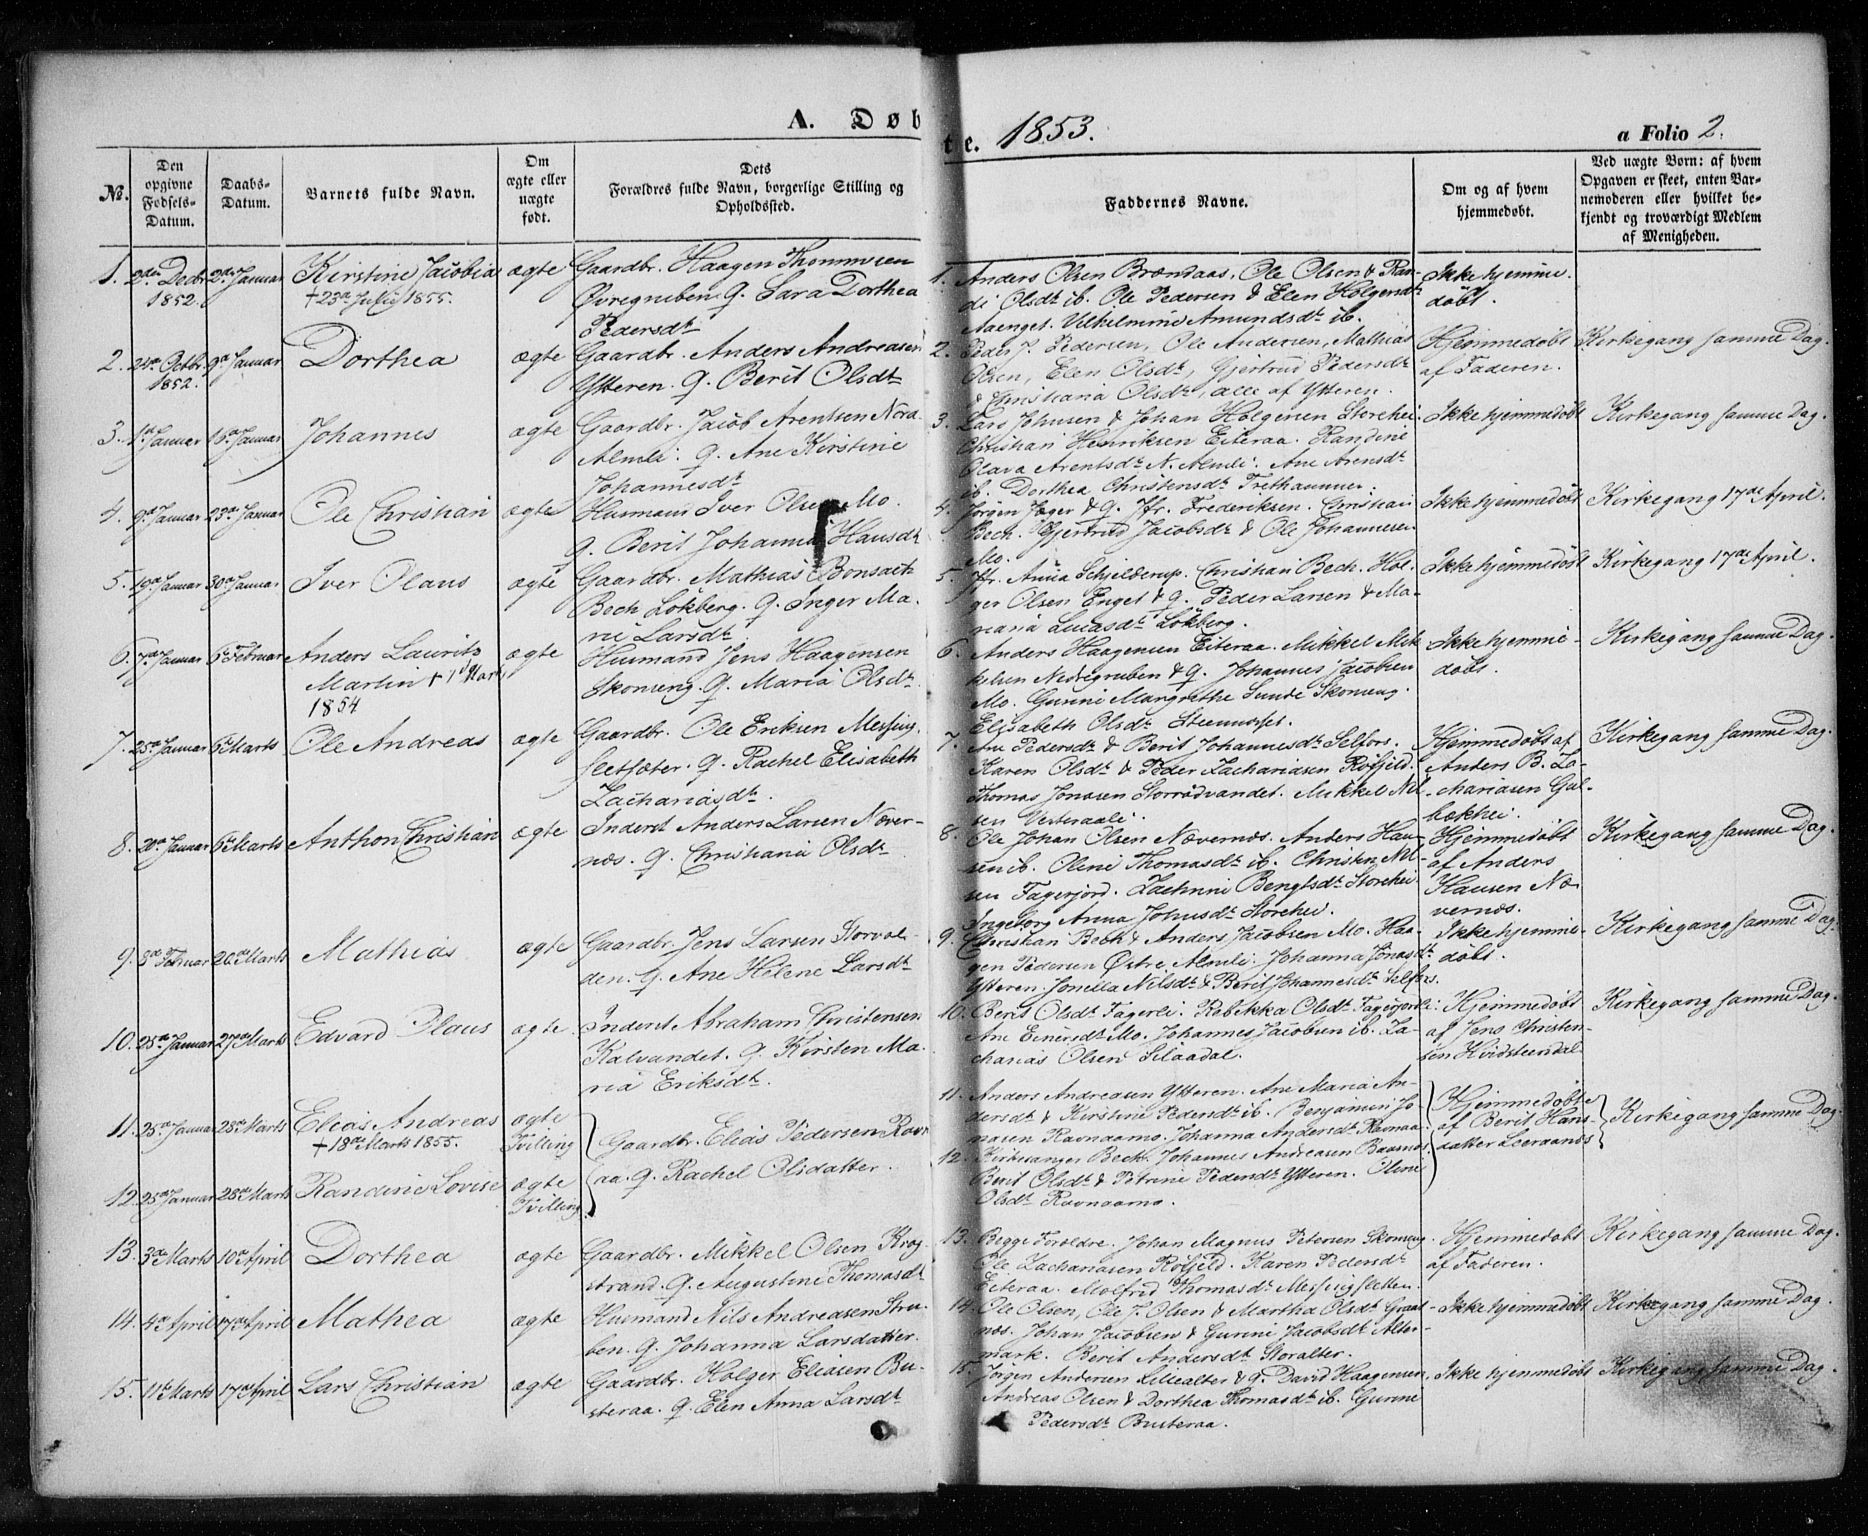 SAT, Ministerialprotokoller, klokkerbøker og fødselsregistre - Nordland, 827/L0392: Ministerialbok nr. 827A04, 1853-1866, s. 2